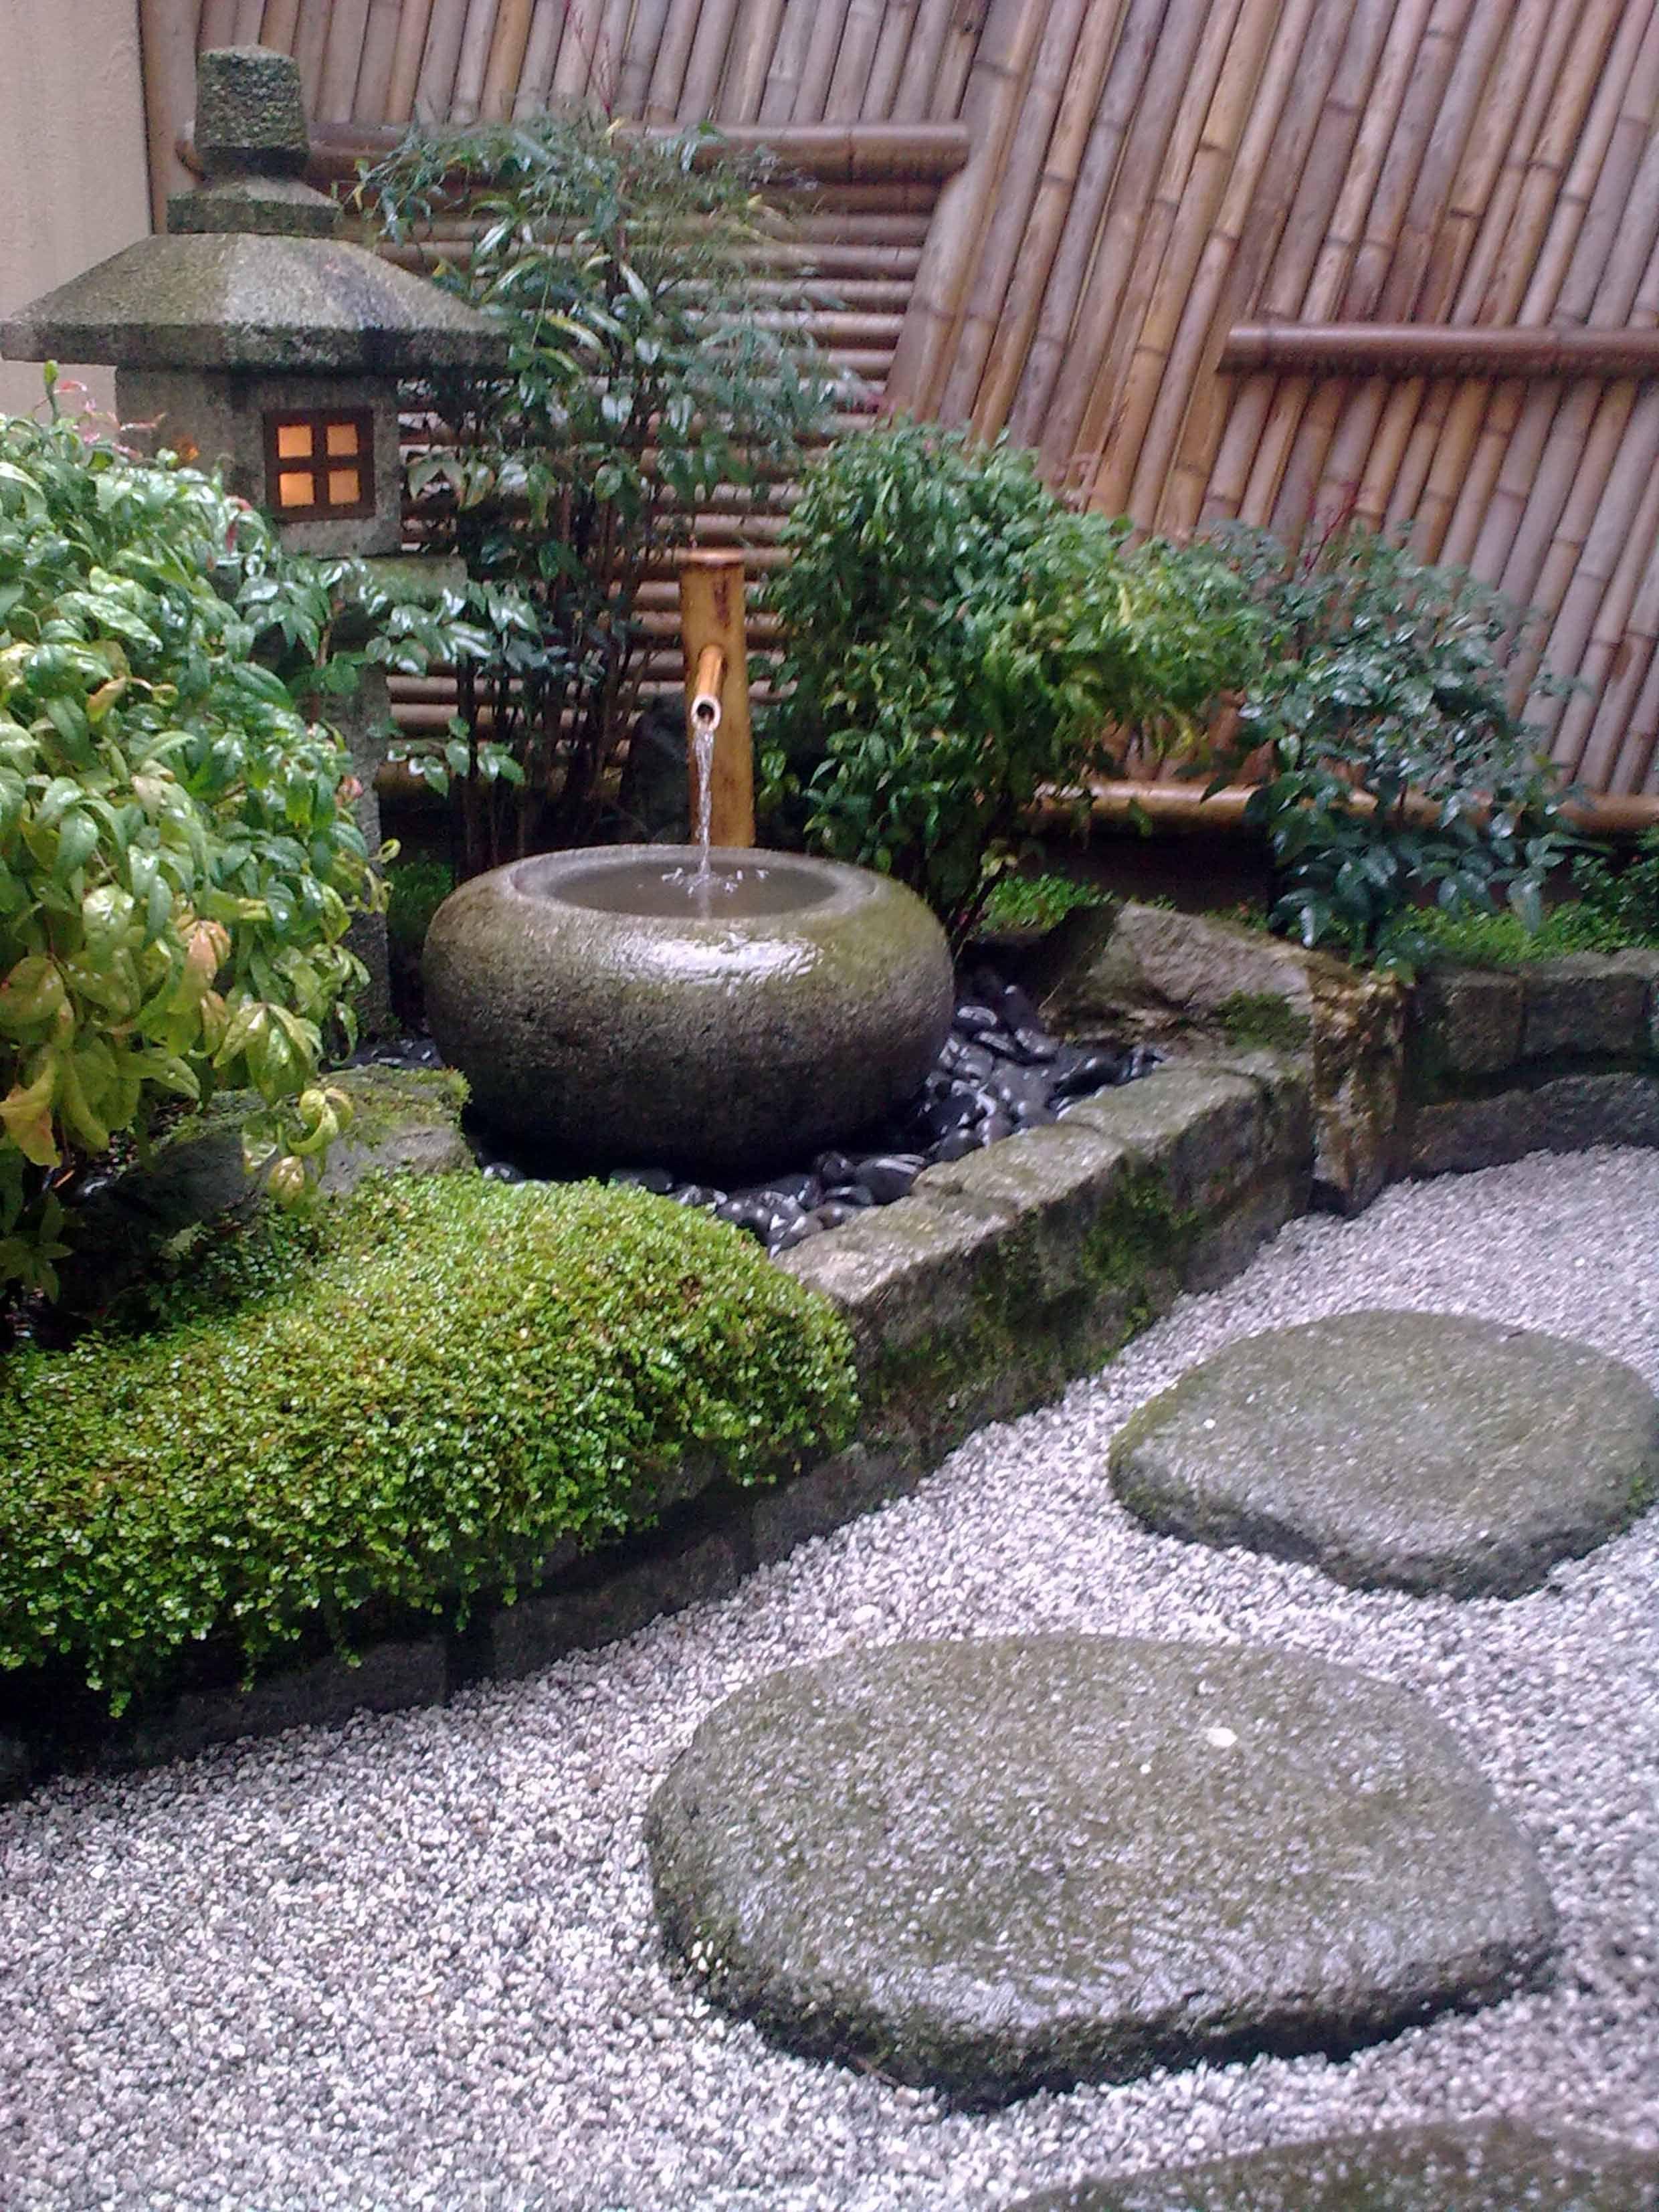 Building A Backyard Zen Garden - Garden Design on Zen Garden Backyard Ideas id=16537